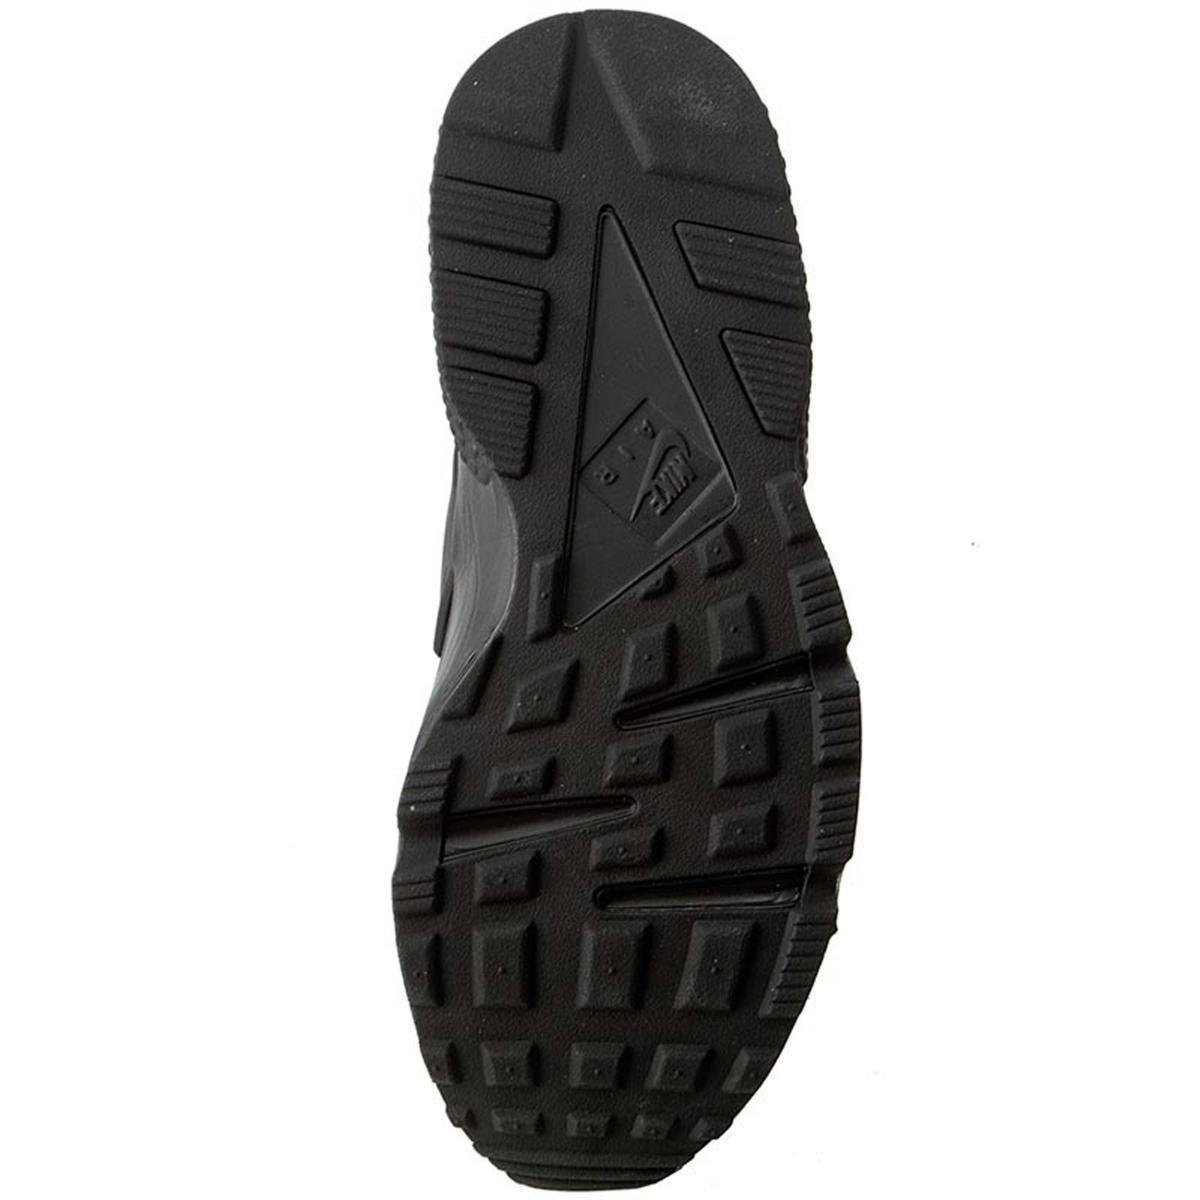 Scarpe Sneakers Nike Air Huarache da Uomo Rif. 318429-003